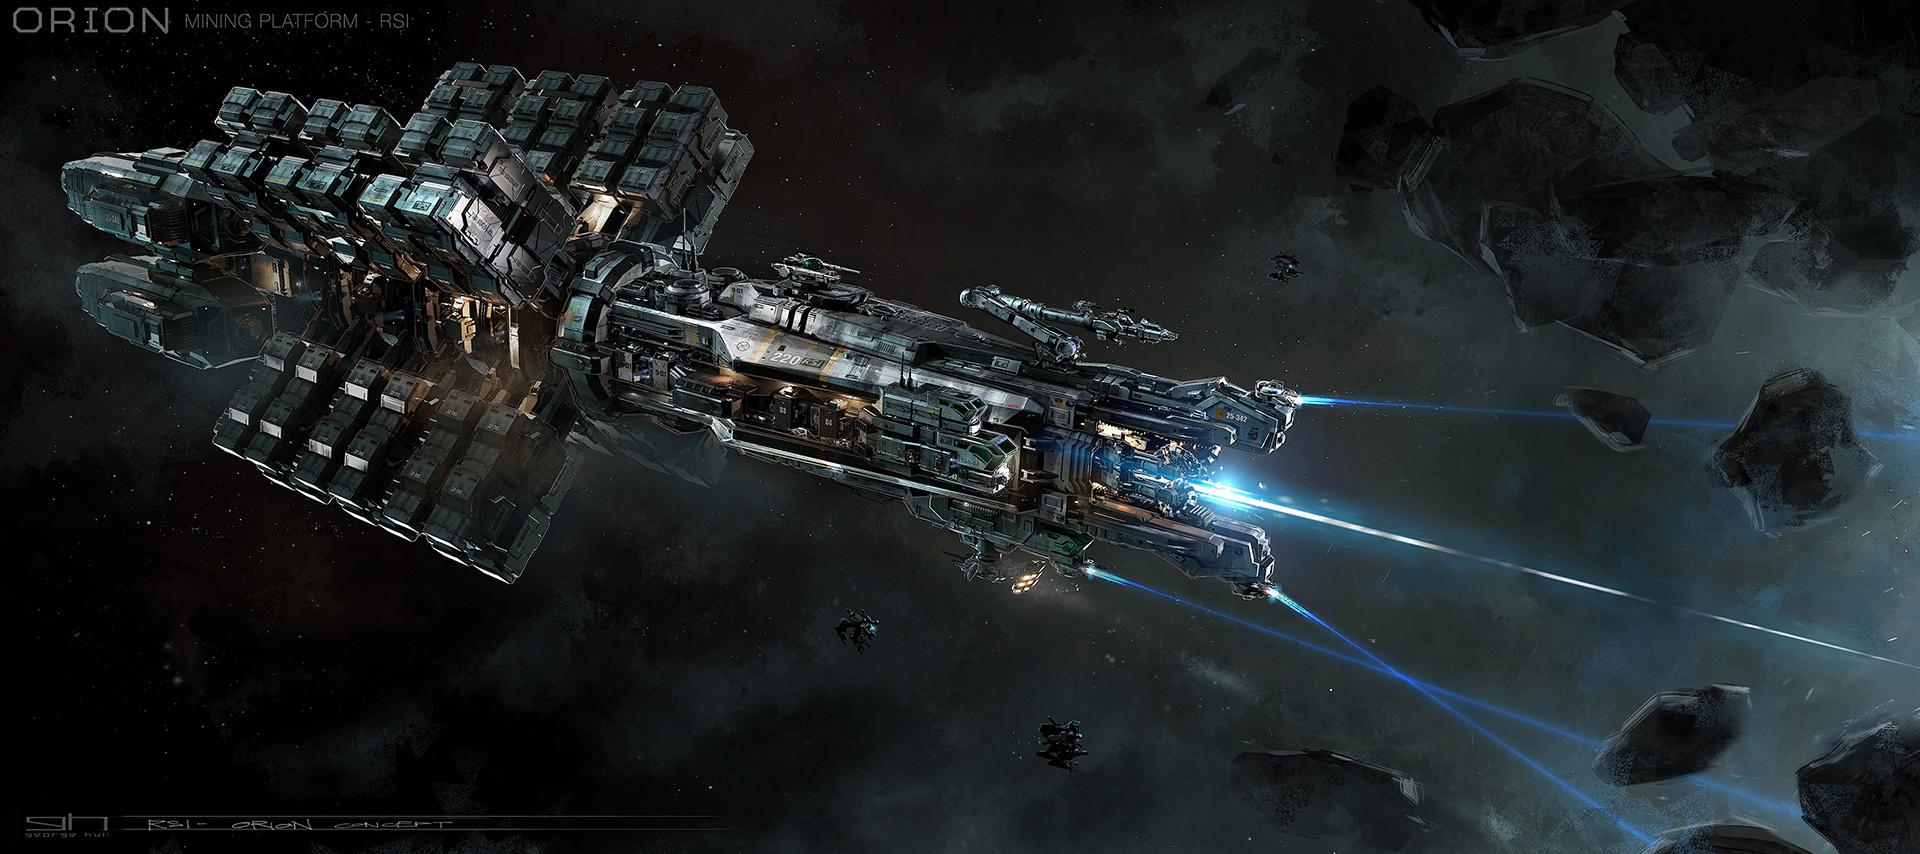 SC: Rugged Colossus - Orion Mining Platform